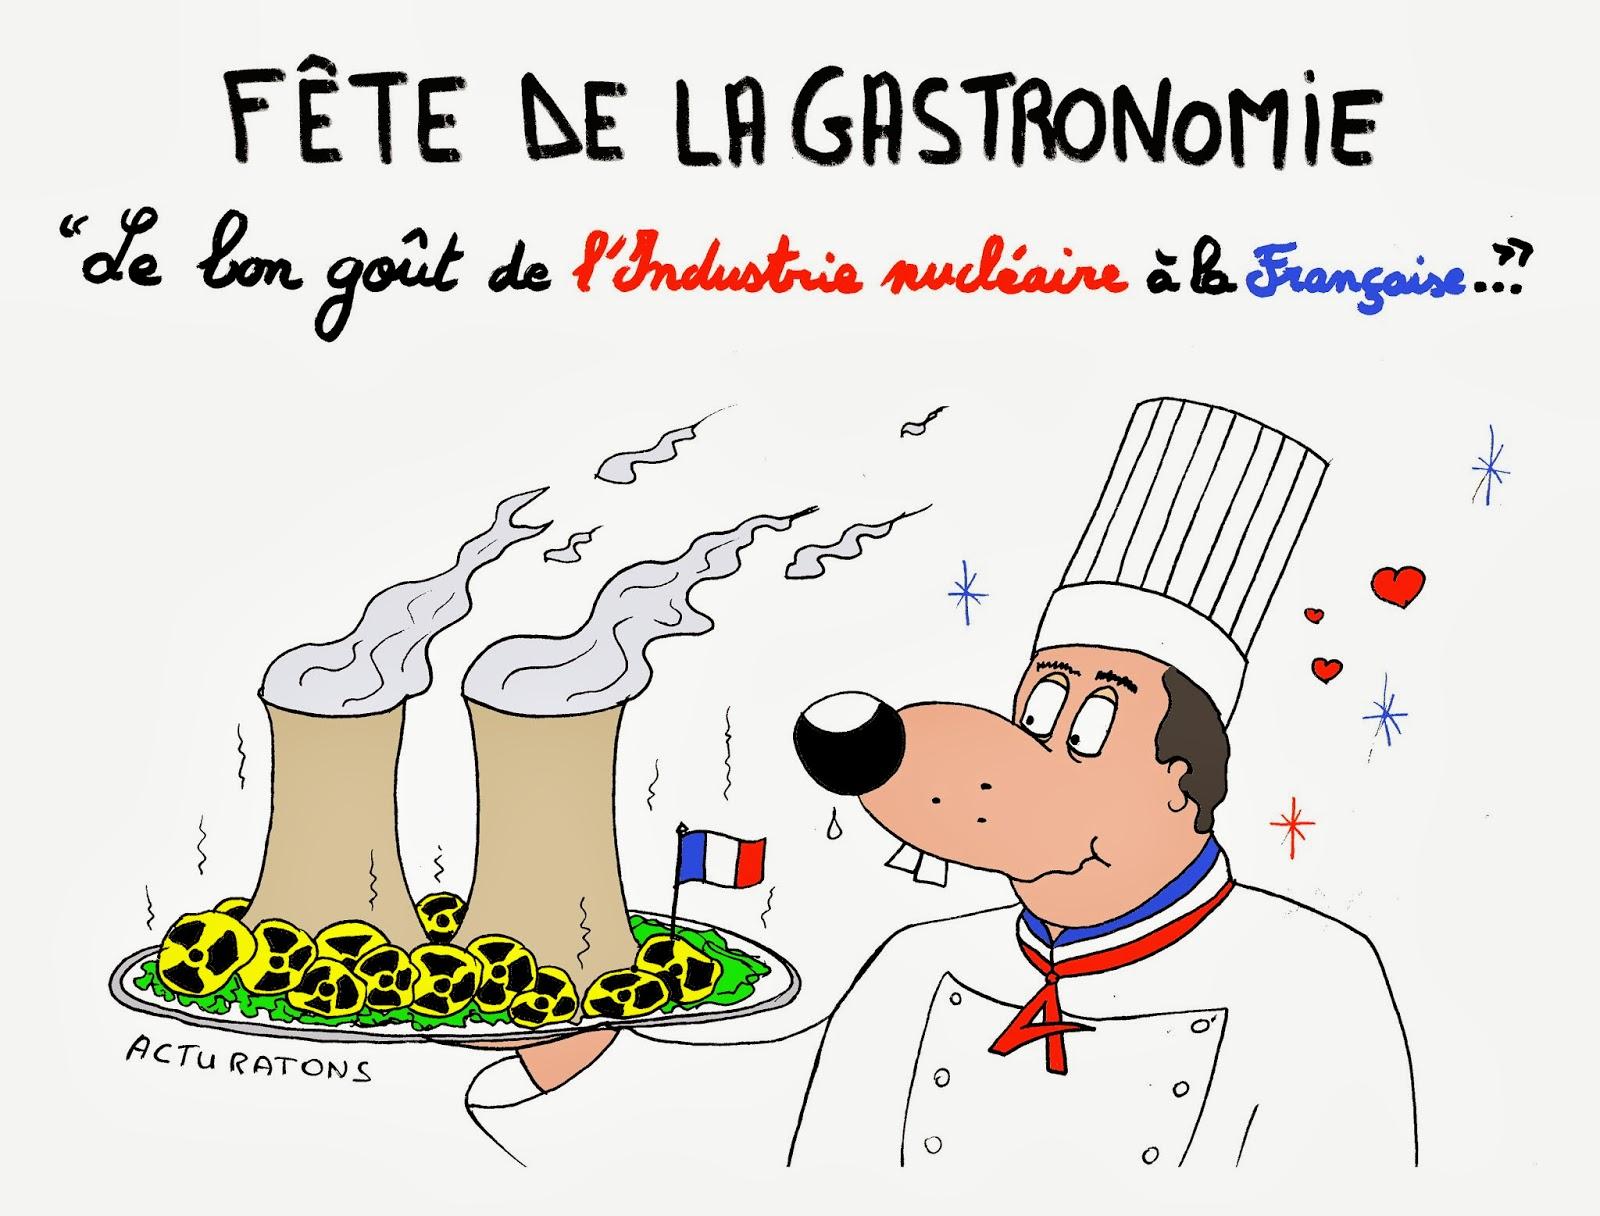 http://3.bp.blogspot.com/-Ddw9_HhcwoA/UjxSw0ENOGI/AAAAAAAALTs/L_AwBztSGMc/s1600/gastronomieindustrienucle%CC%81airefranc%CC%A7aise.jpg